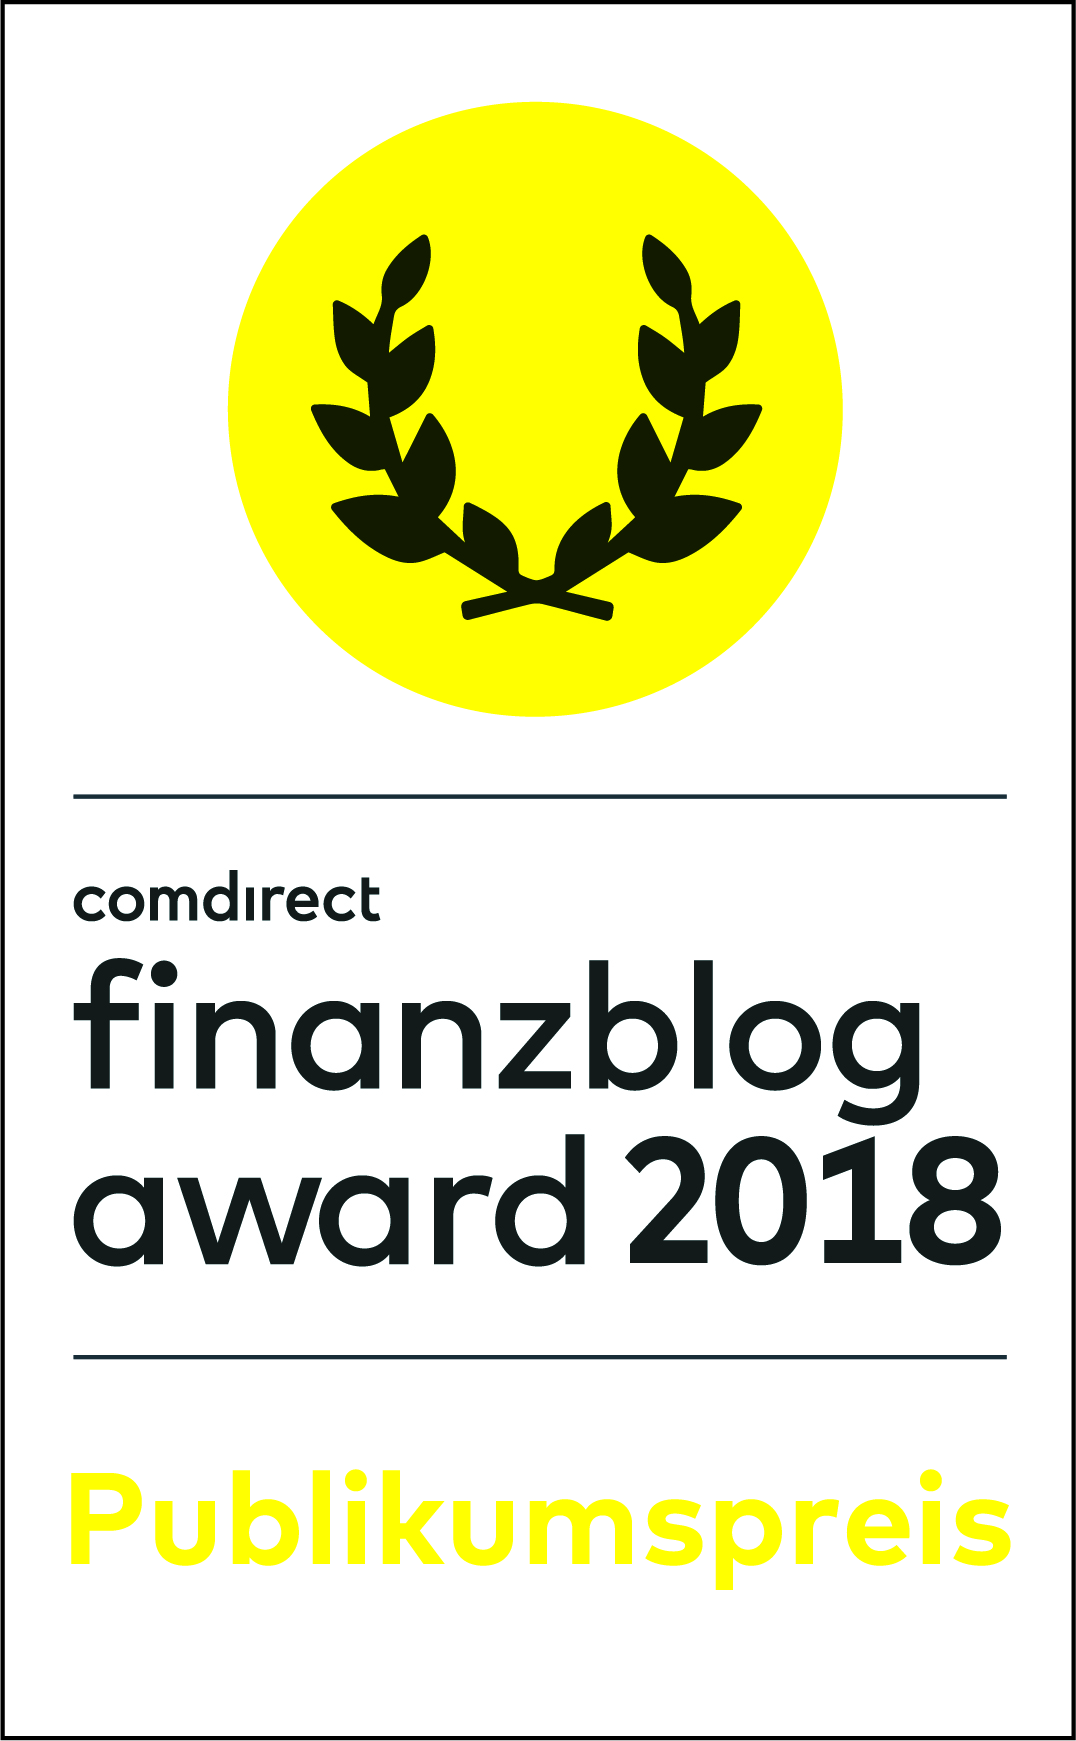 Warum Bares? - Logo comdirect finanzblog award 2018